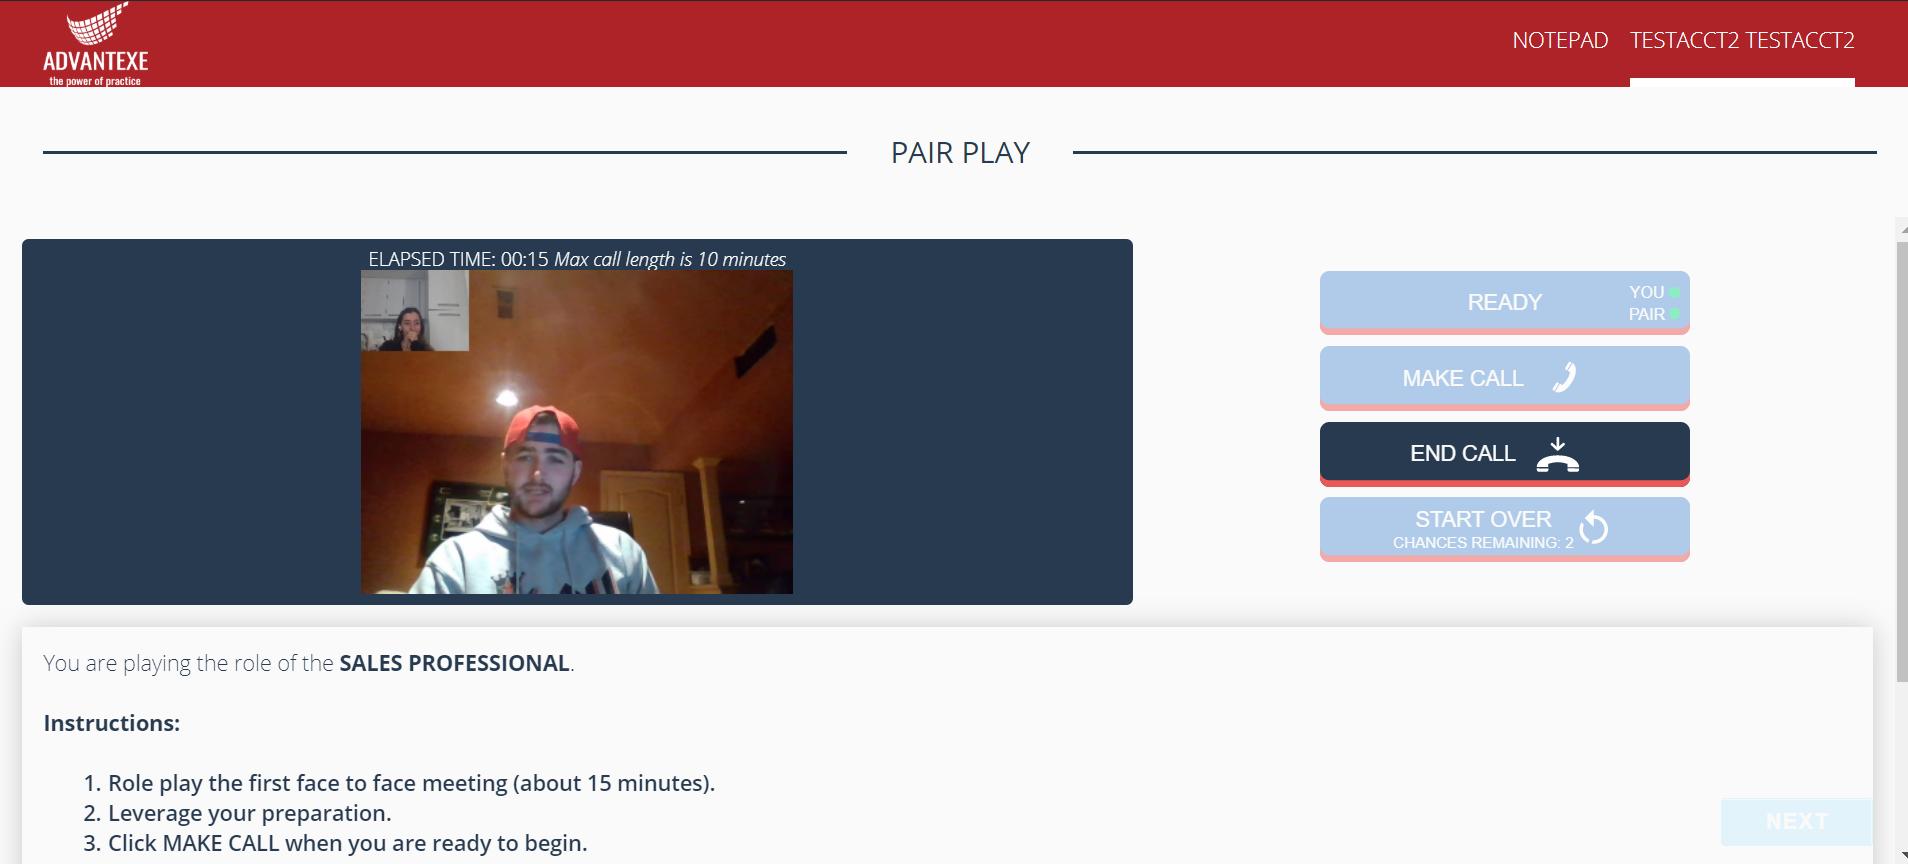 Pair_play_1_video